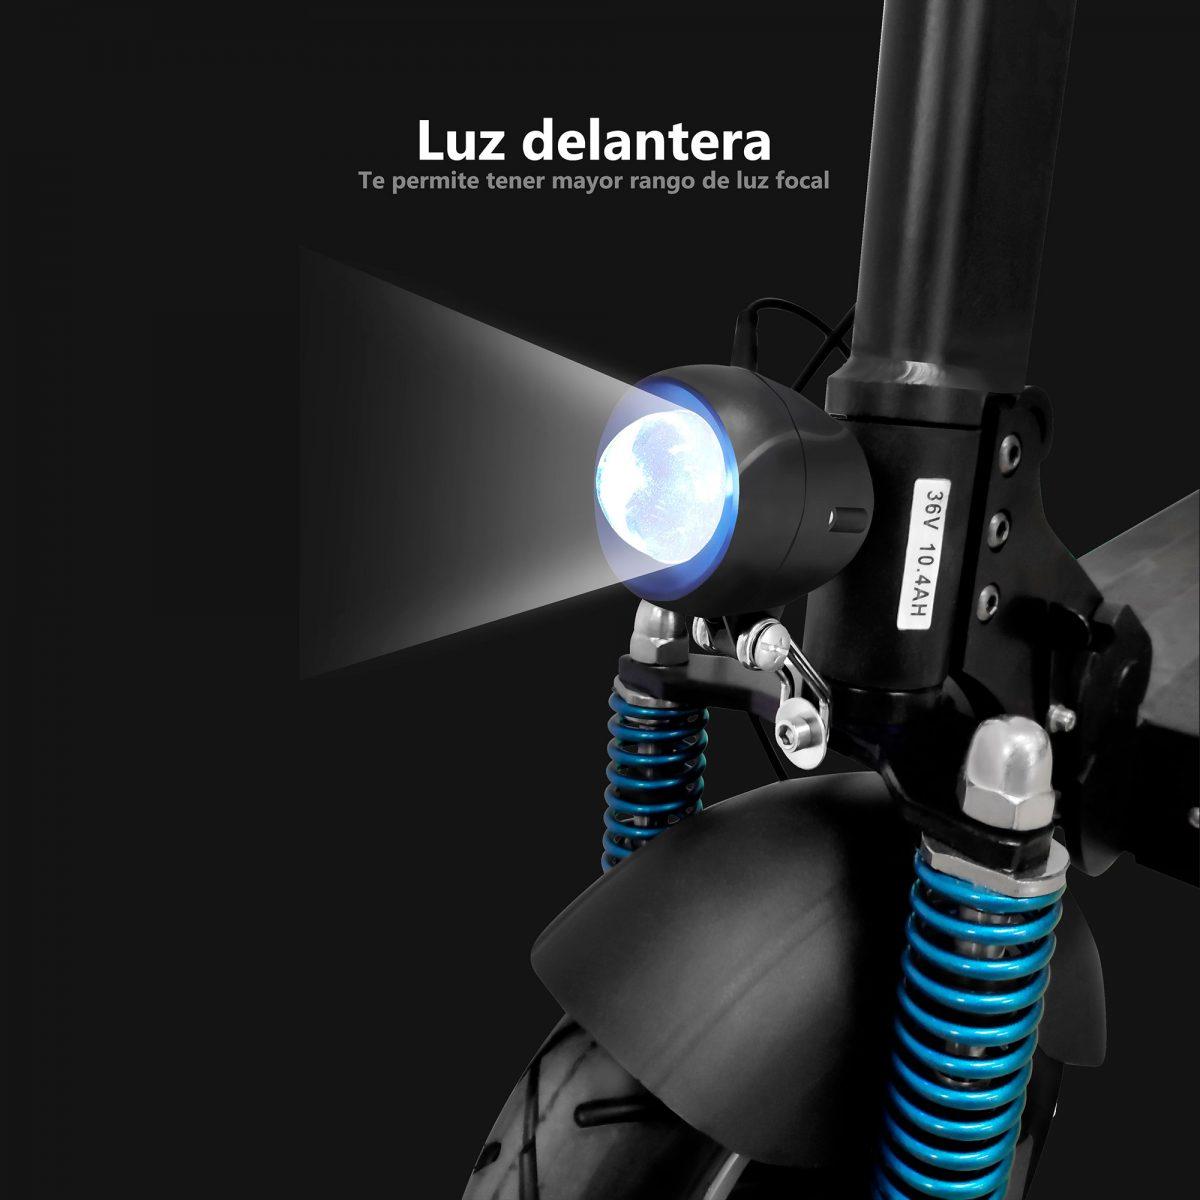 Luz delantera de patinete eléctrico Zrino - Zwheel